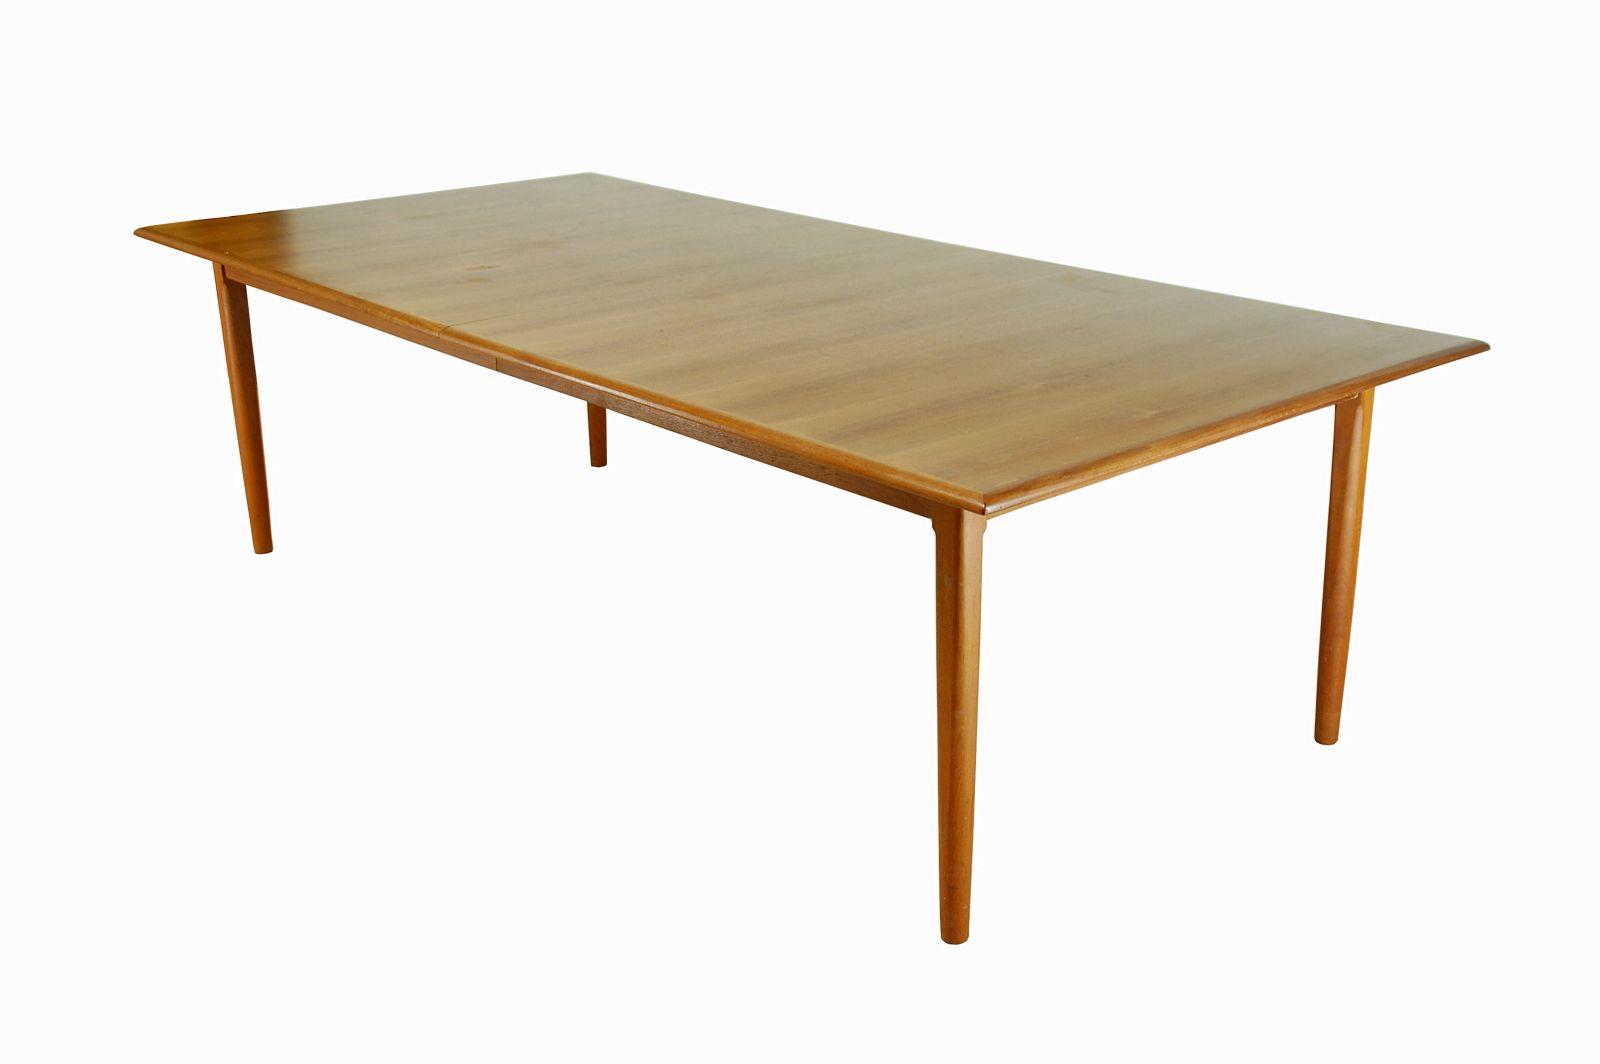 Large Vintage Danish Teak Dining Table for sale at Pamono : large vintage danish teak dining table 4 from www.pamono.co.uk size 1600 x 1064 jpeg 39kB